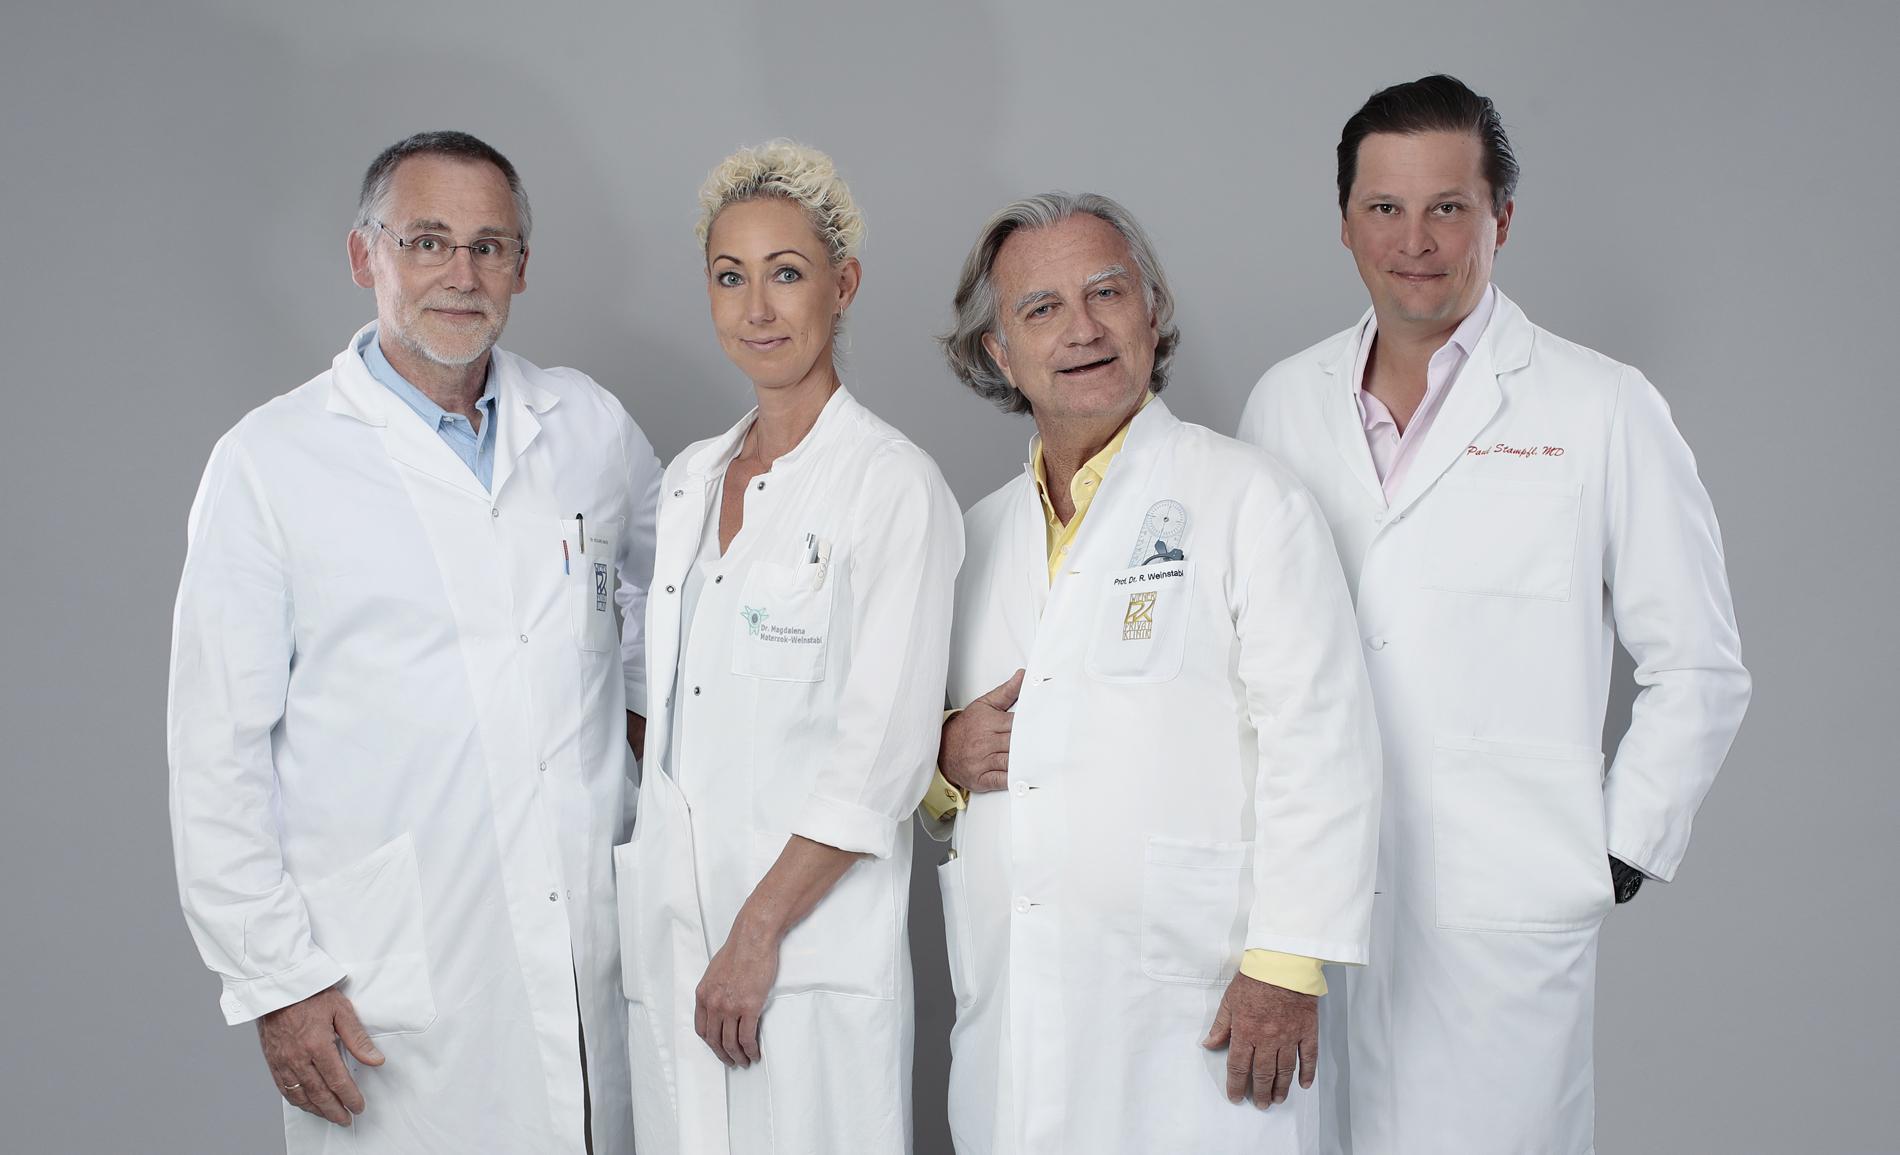 Kompetenzzentrum Gelenkschirurgie / OA Dr. med. univ. Magdalena Materzok-Weinstabl (Foto: Uroš Hočevar)